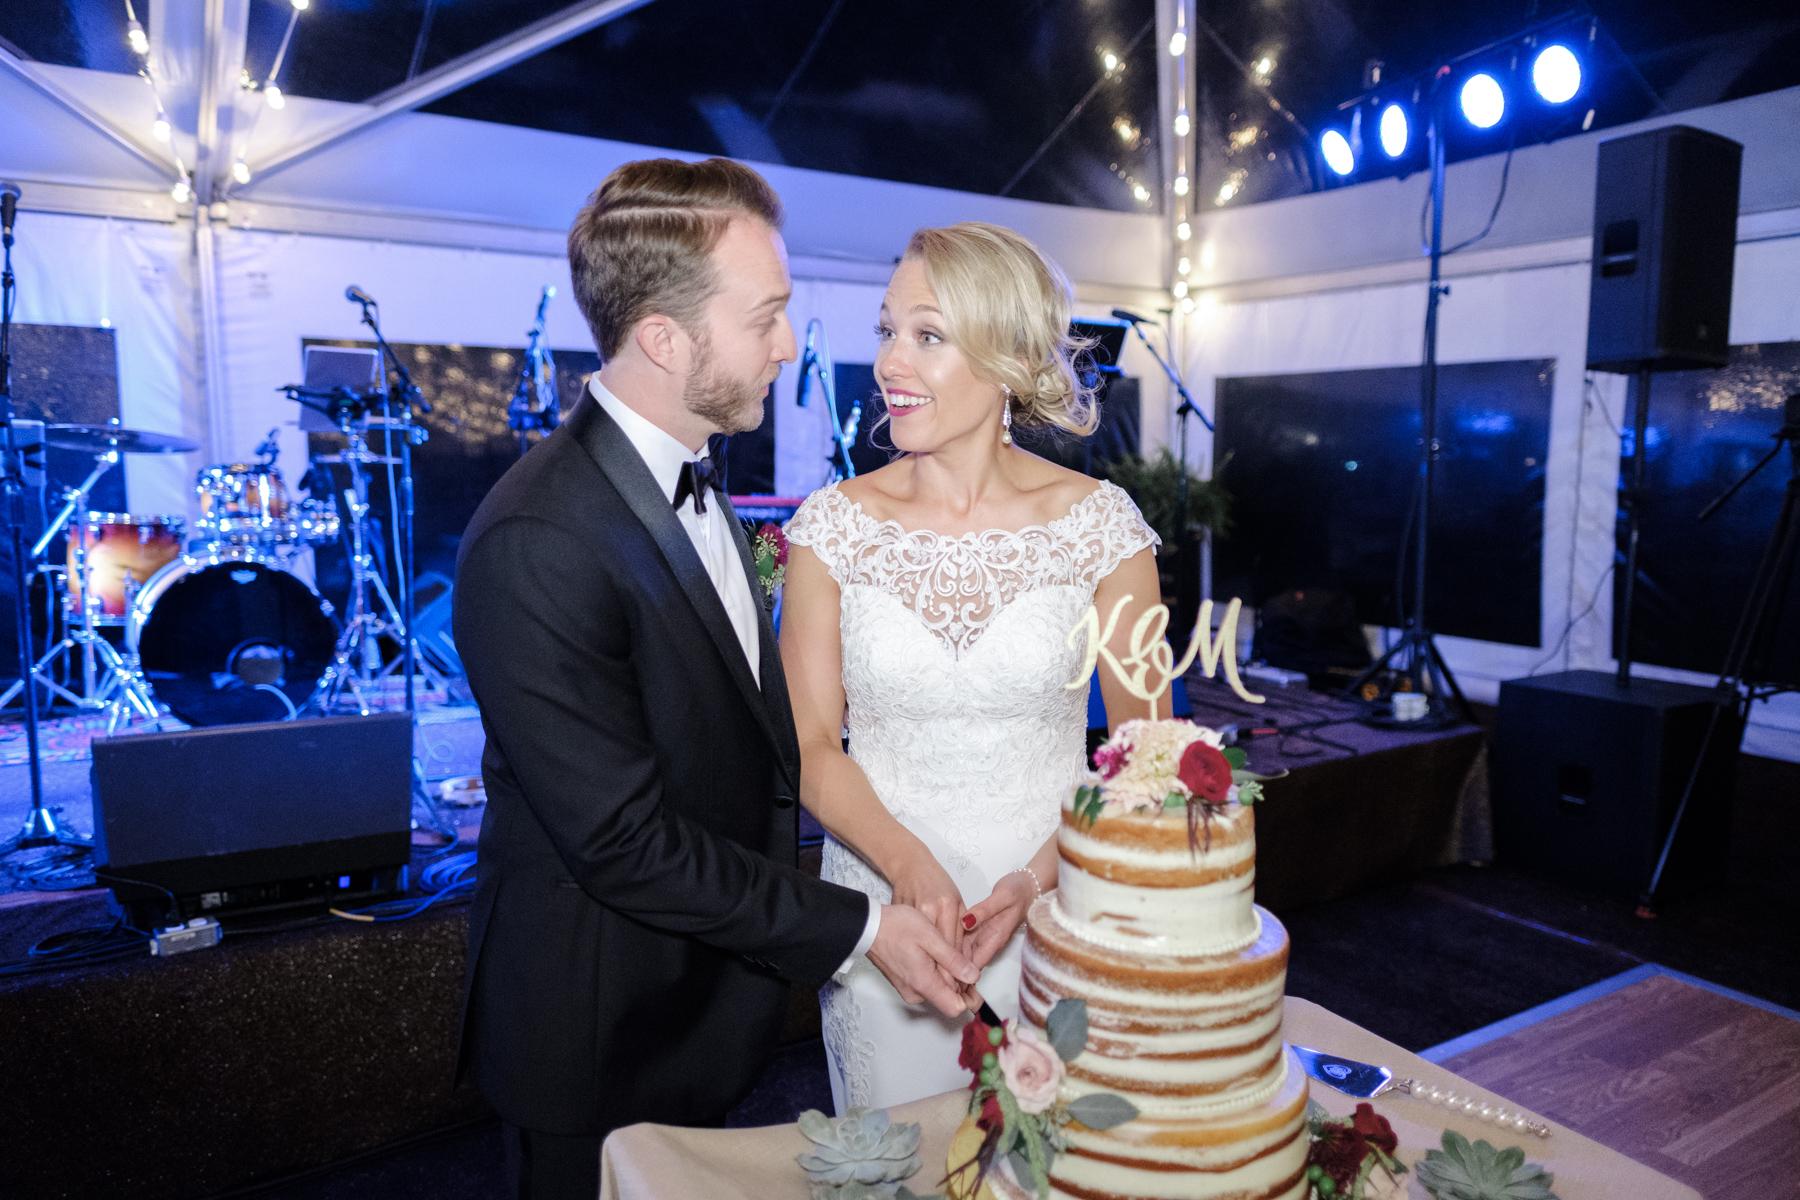 2017_BAP_KalliMatt_Gleneagles_CountryClub_Lemont_Wedding-69.jpg